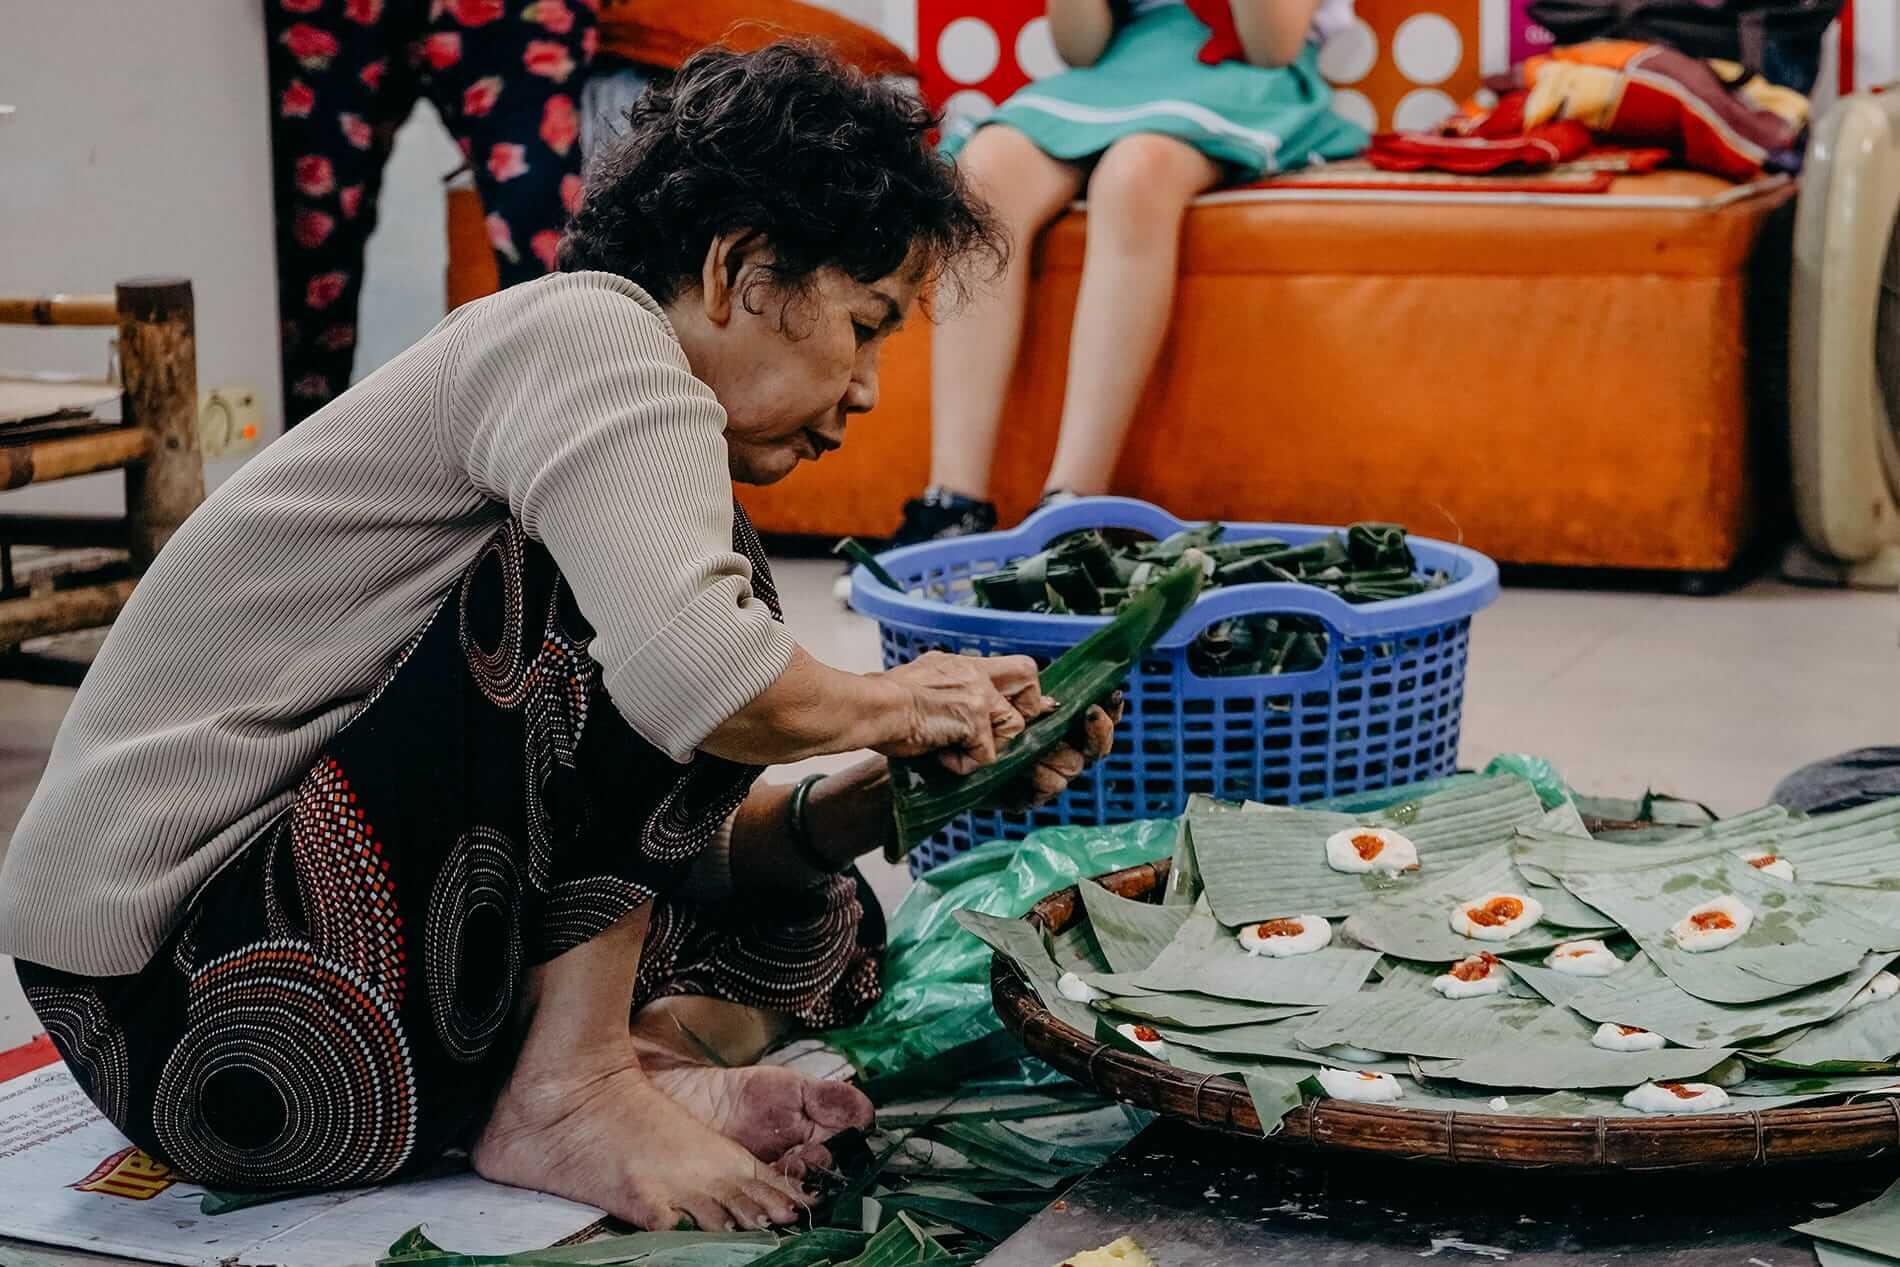 A local woman prepares her dumplings